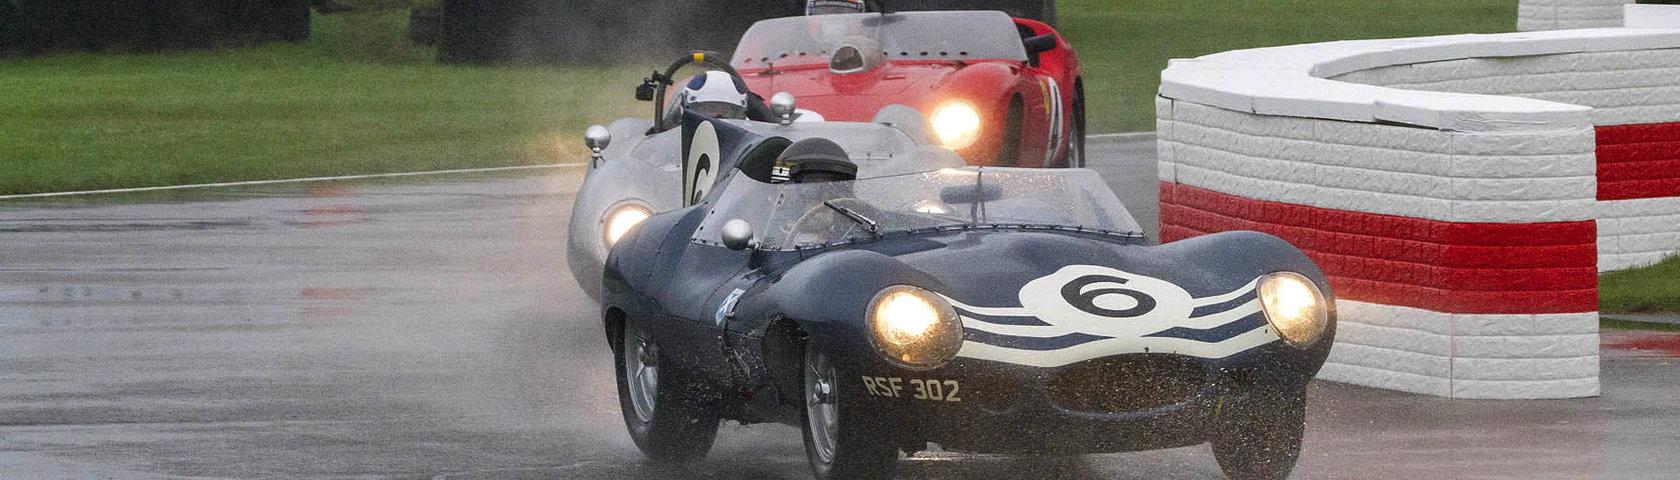 St Christian Glasel Ahead Of Ferrari Dino Rg